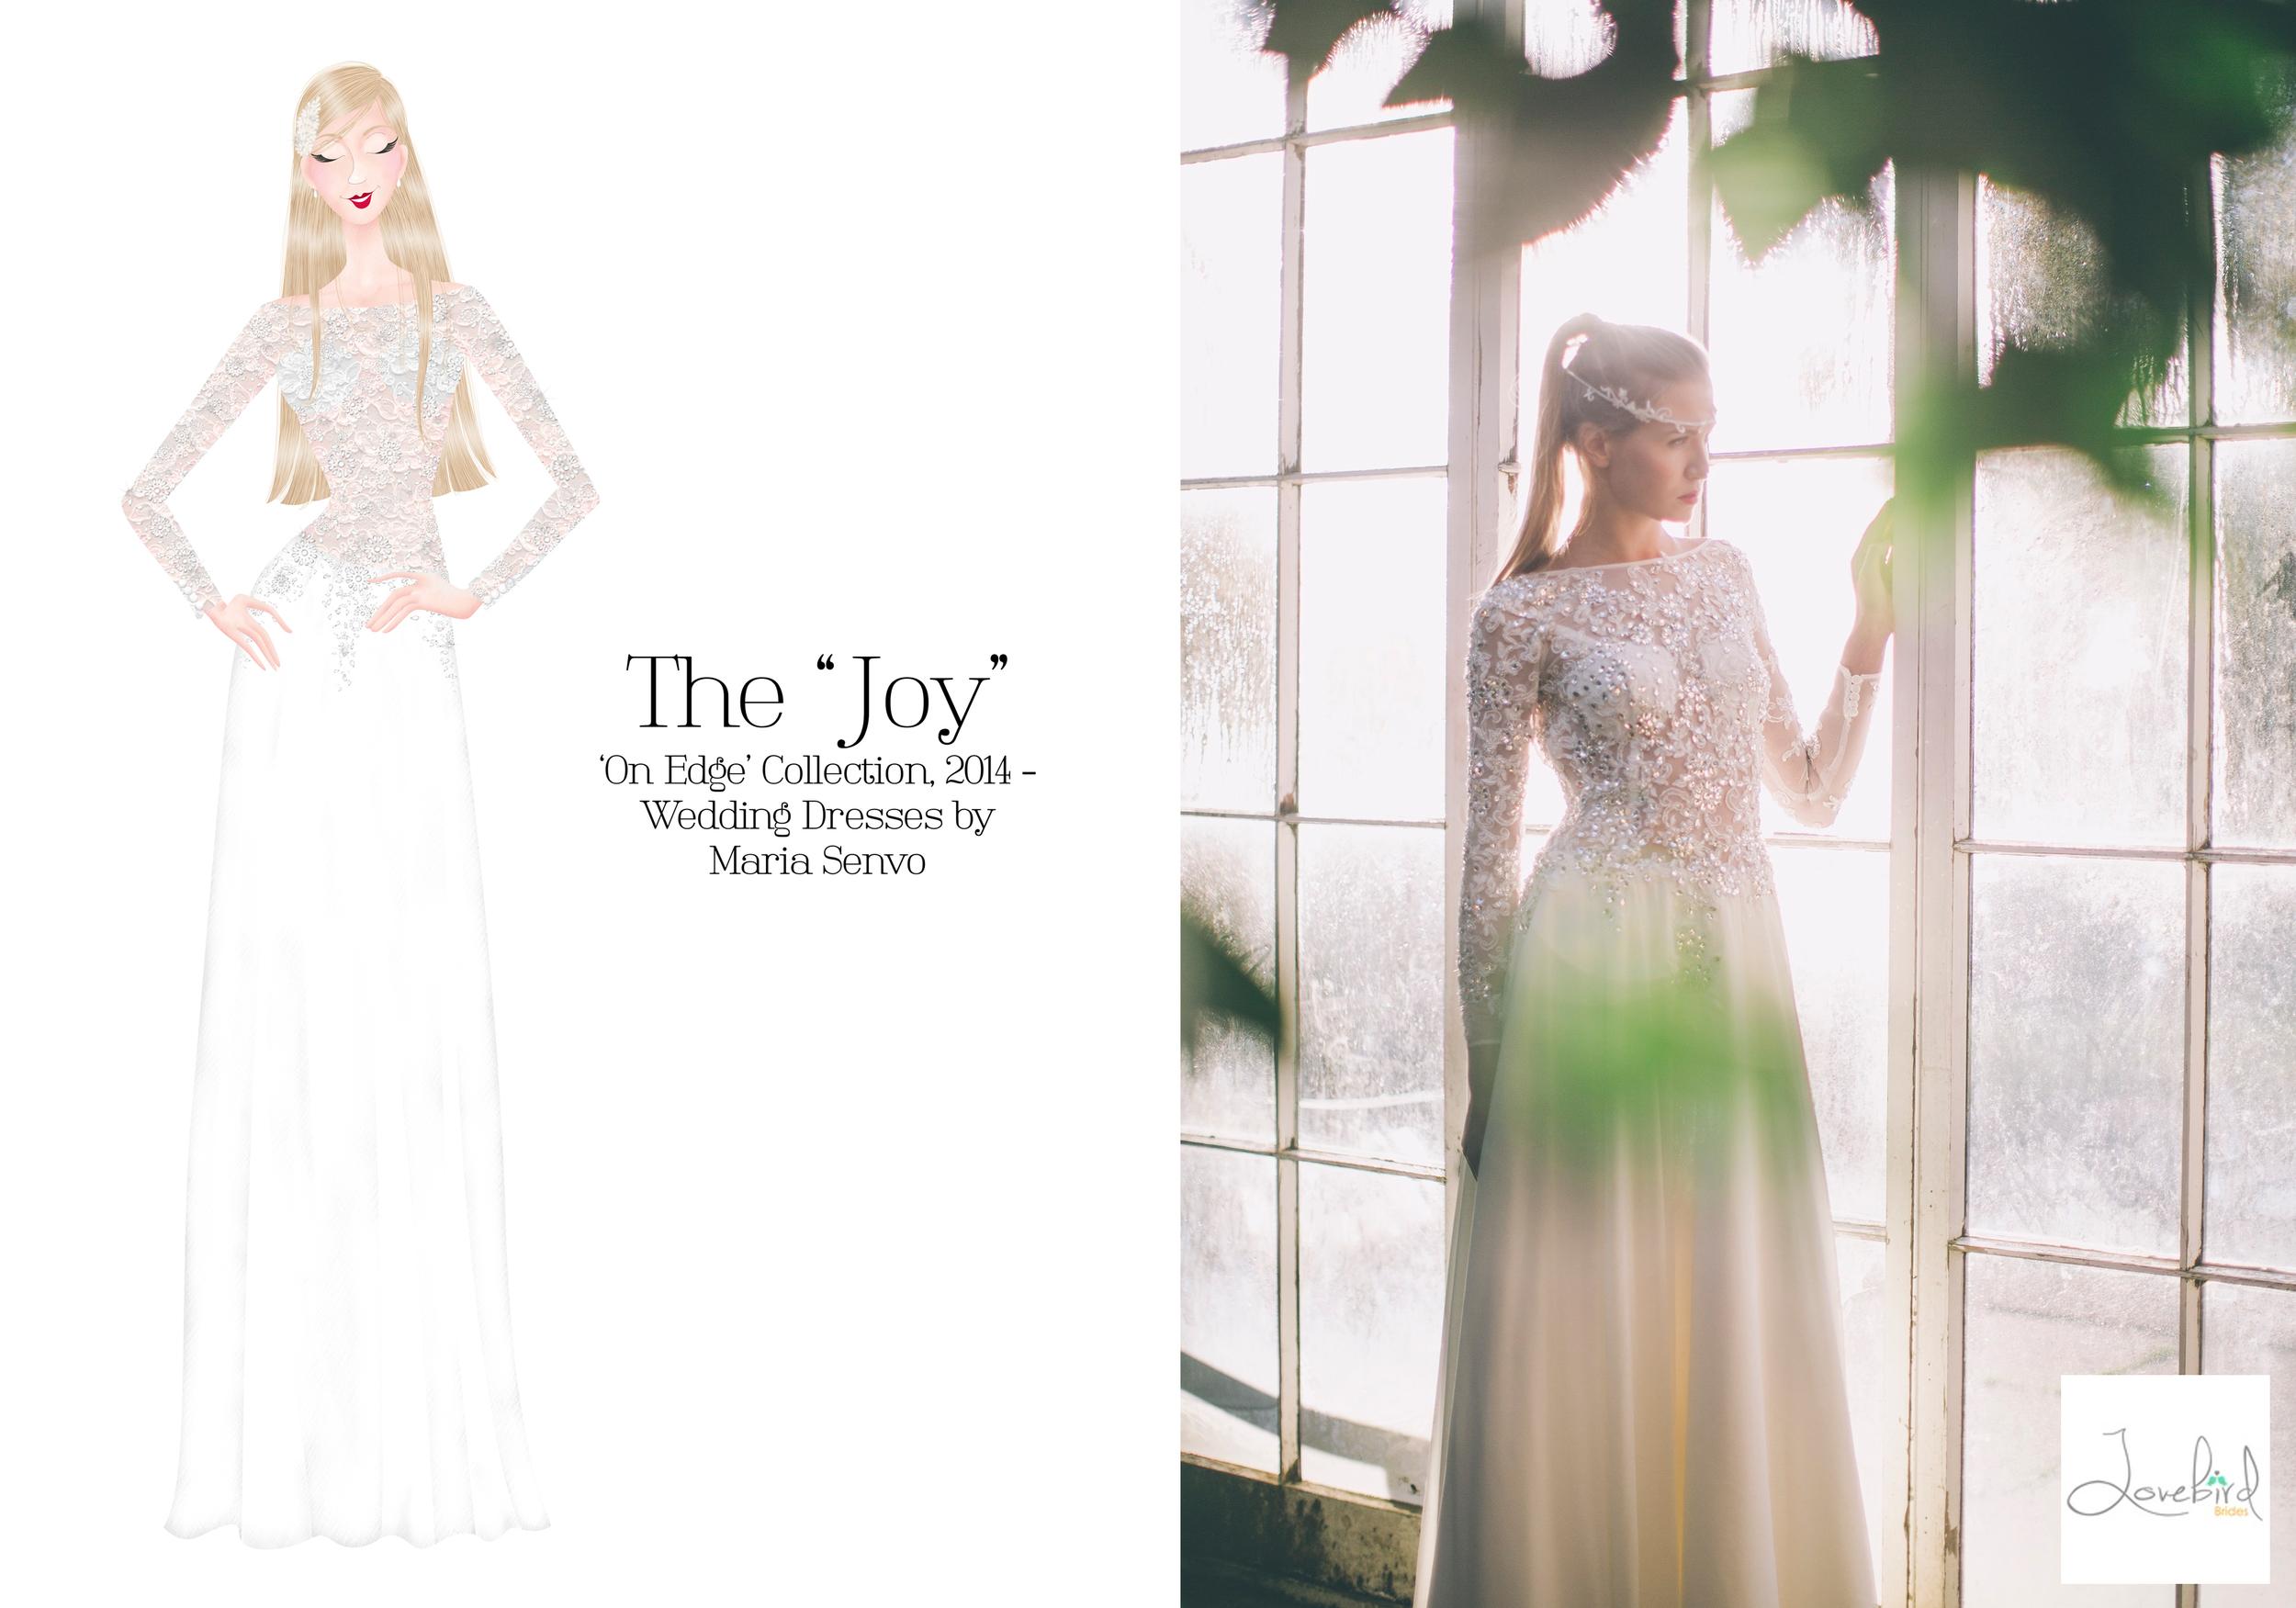 The-Joy.jpg